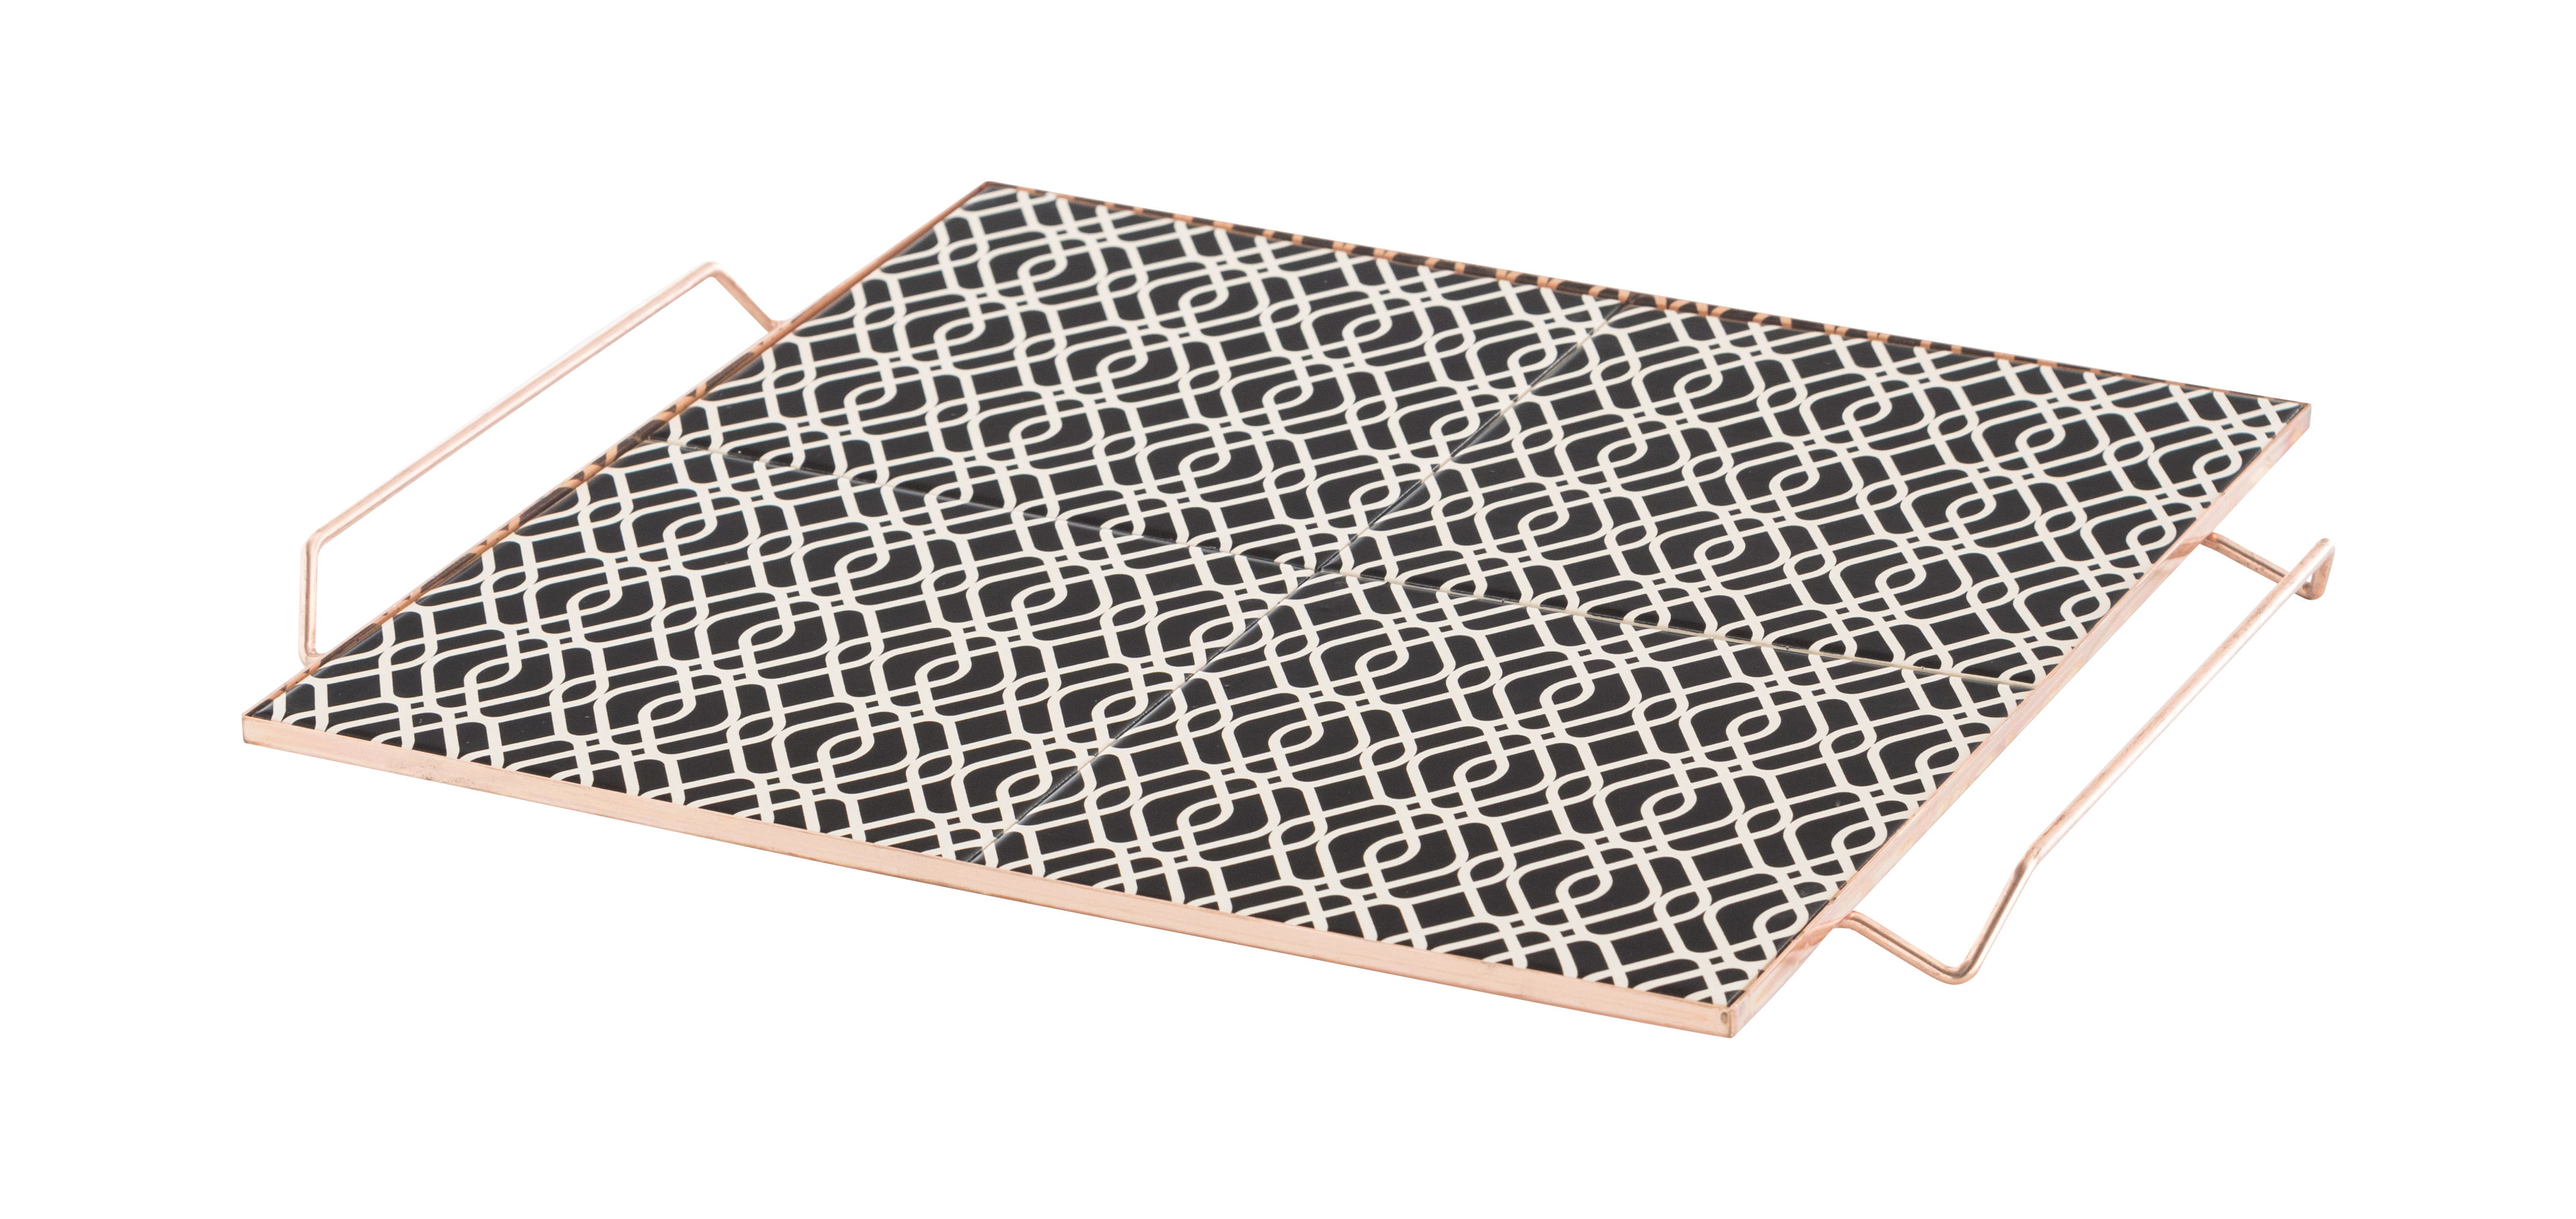 Tableware - Trays - Mix&Match Tray - 40 x 40 cm / Ceramic & copper by Gan - Black & white - Ceramic, Copper plated aluminium